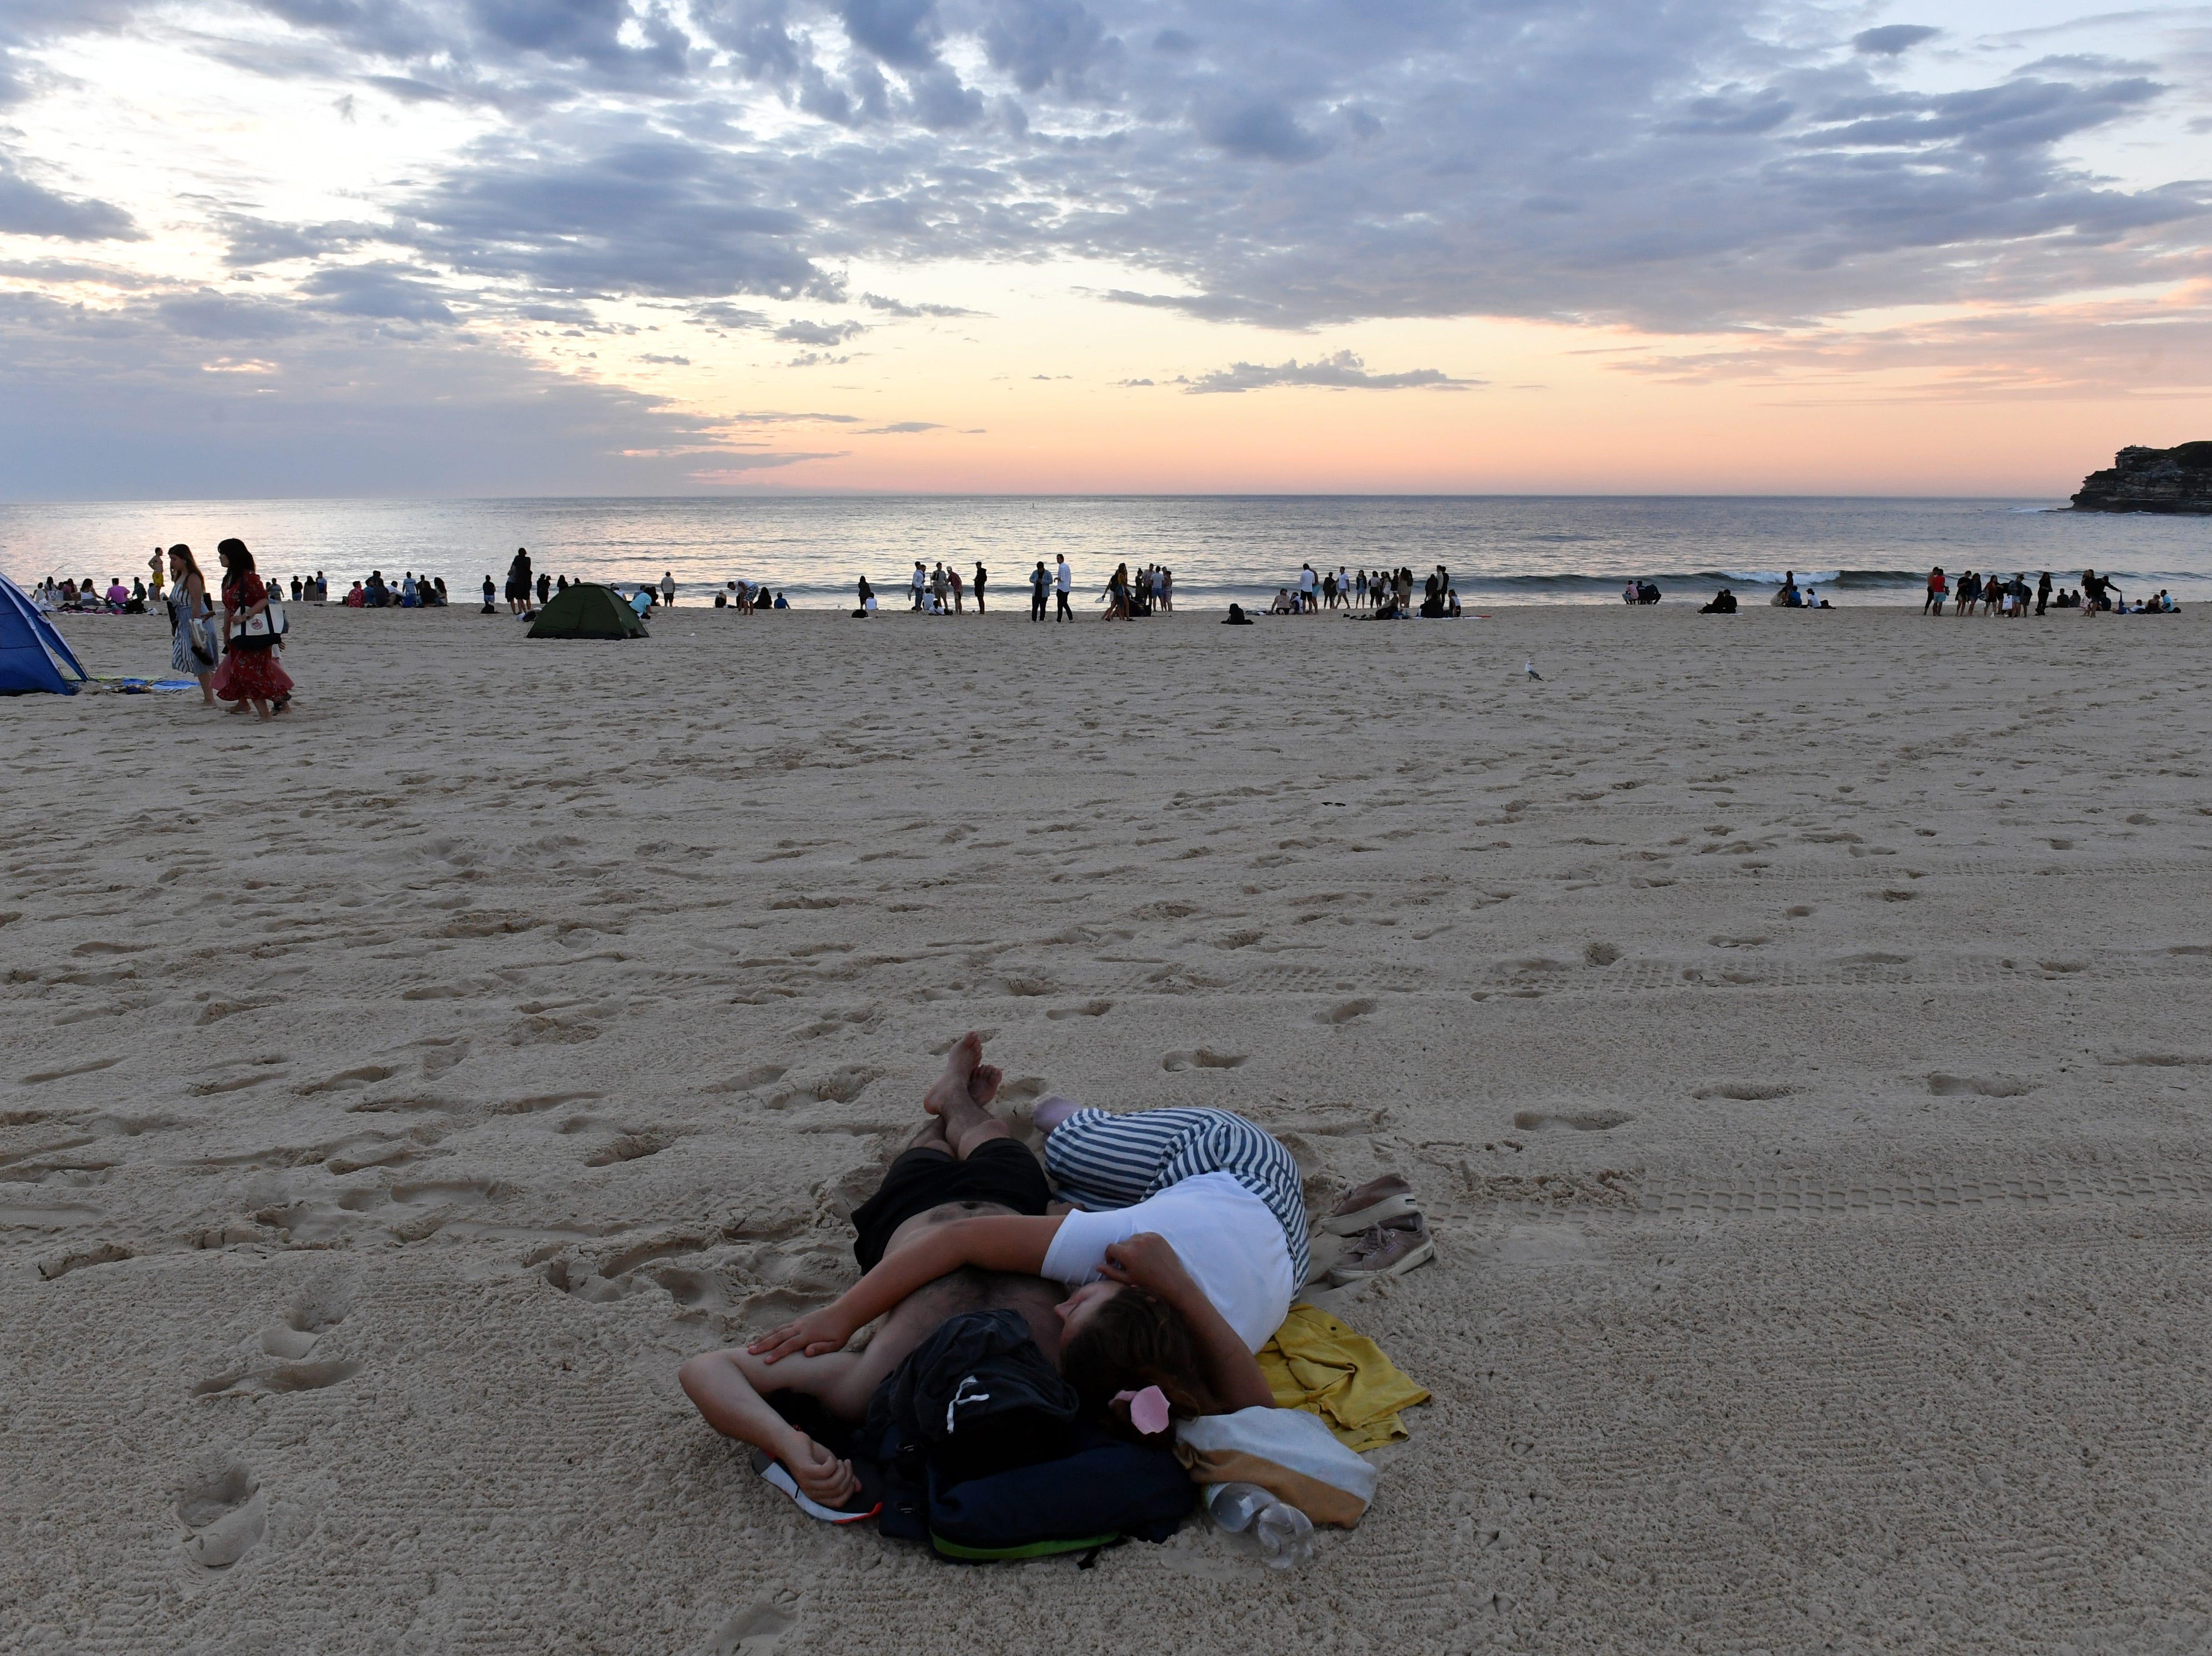 Revelers sleep on the stand during sunrise on New Year's Day at Bondi Beach in Sydney, Australia on Jan.1, 2018.